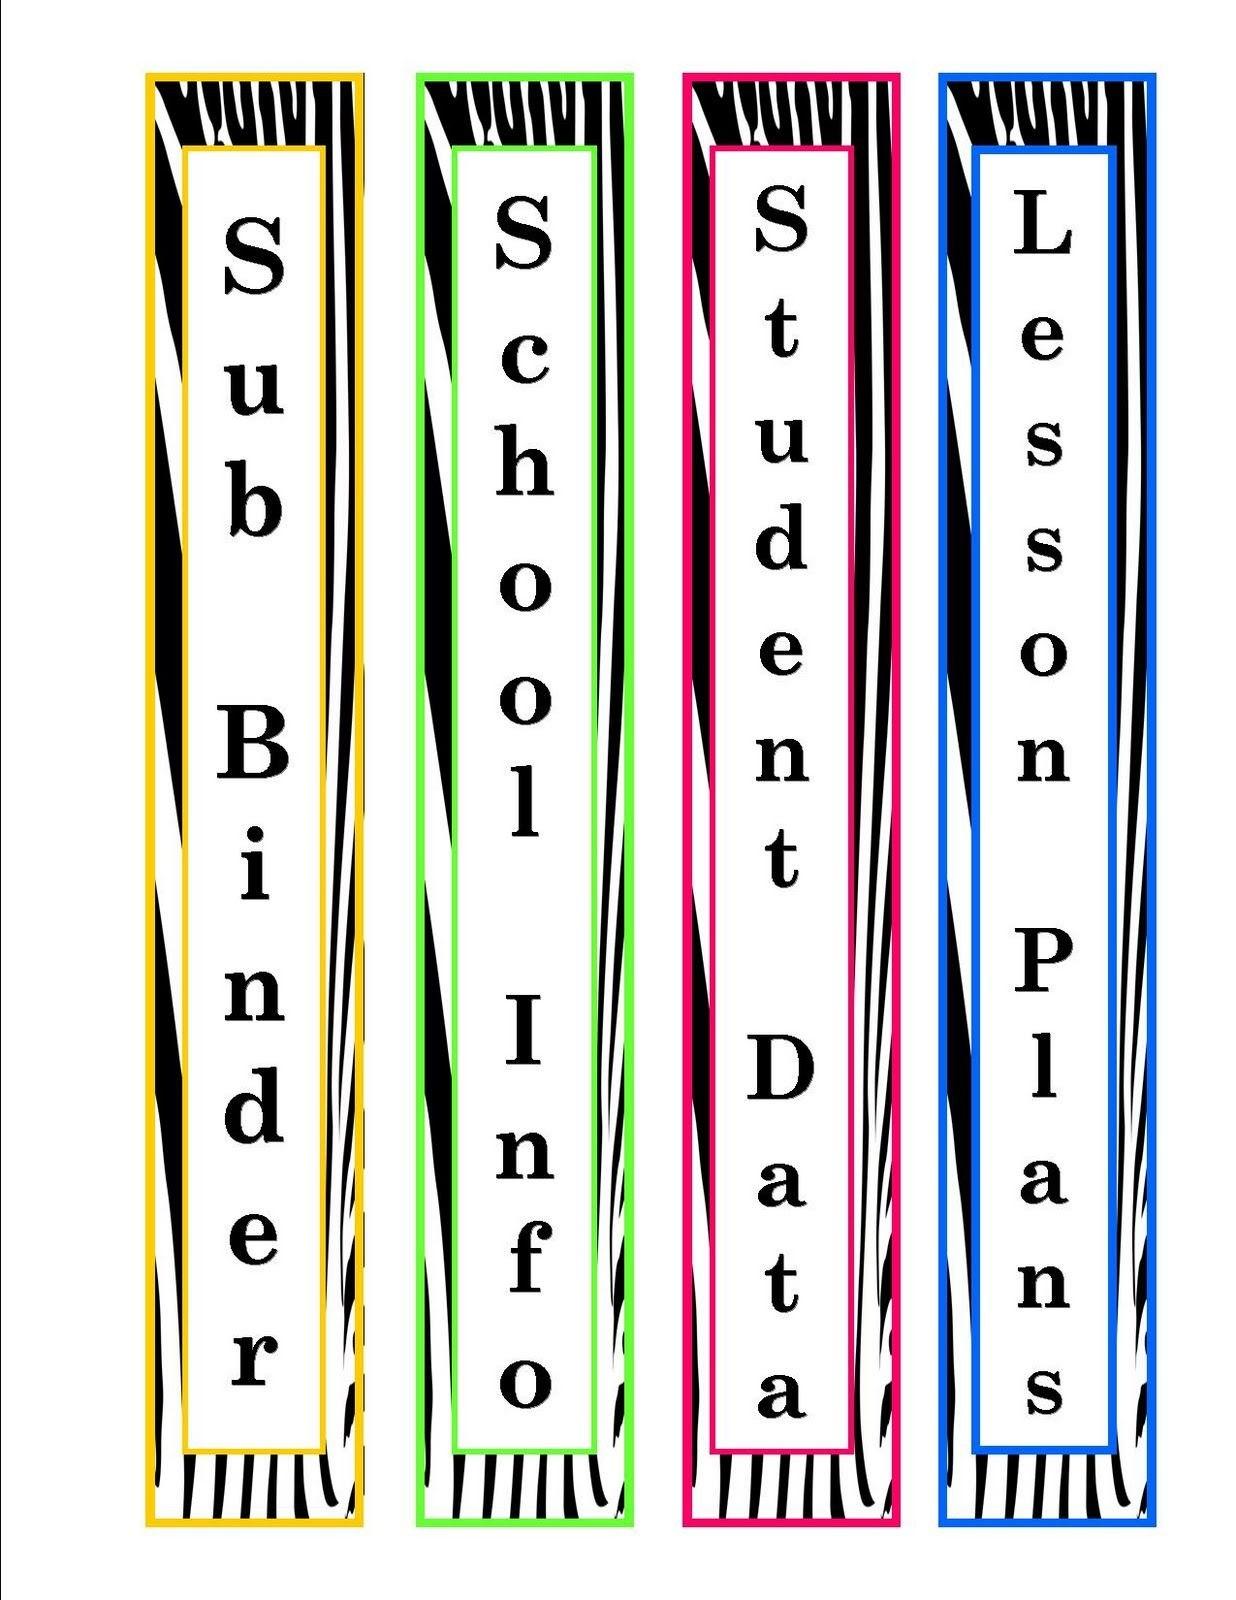 Binder Spine Label Template Breathtaking Ideas   Staples Regarding Folder Spine Labels Template